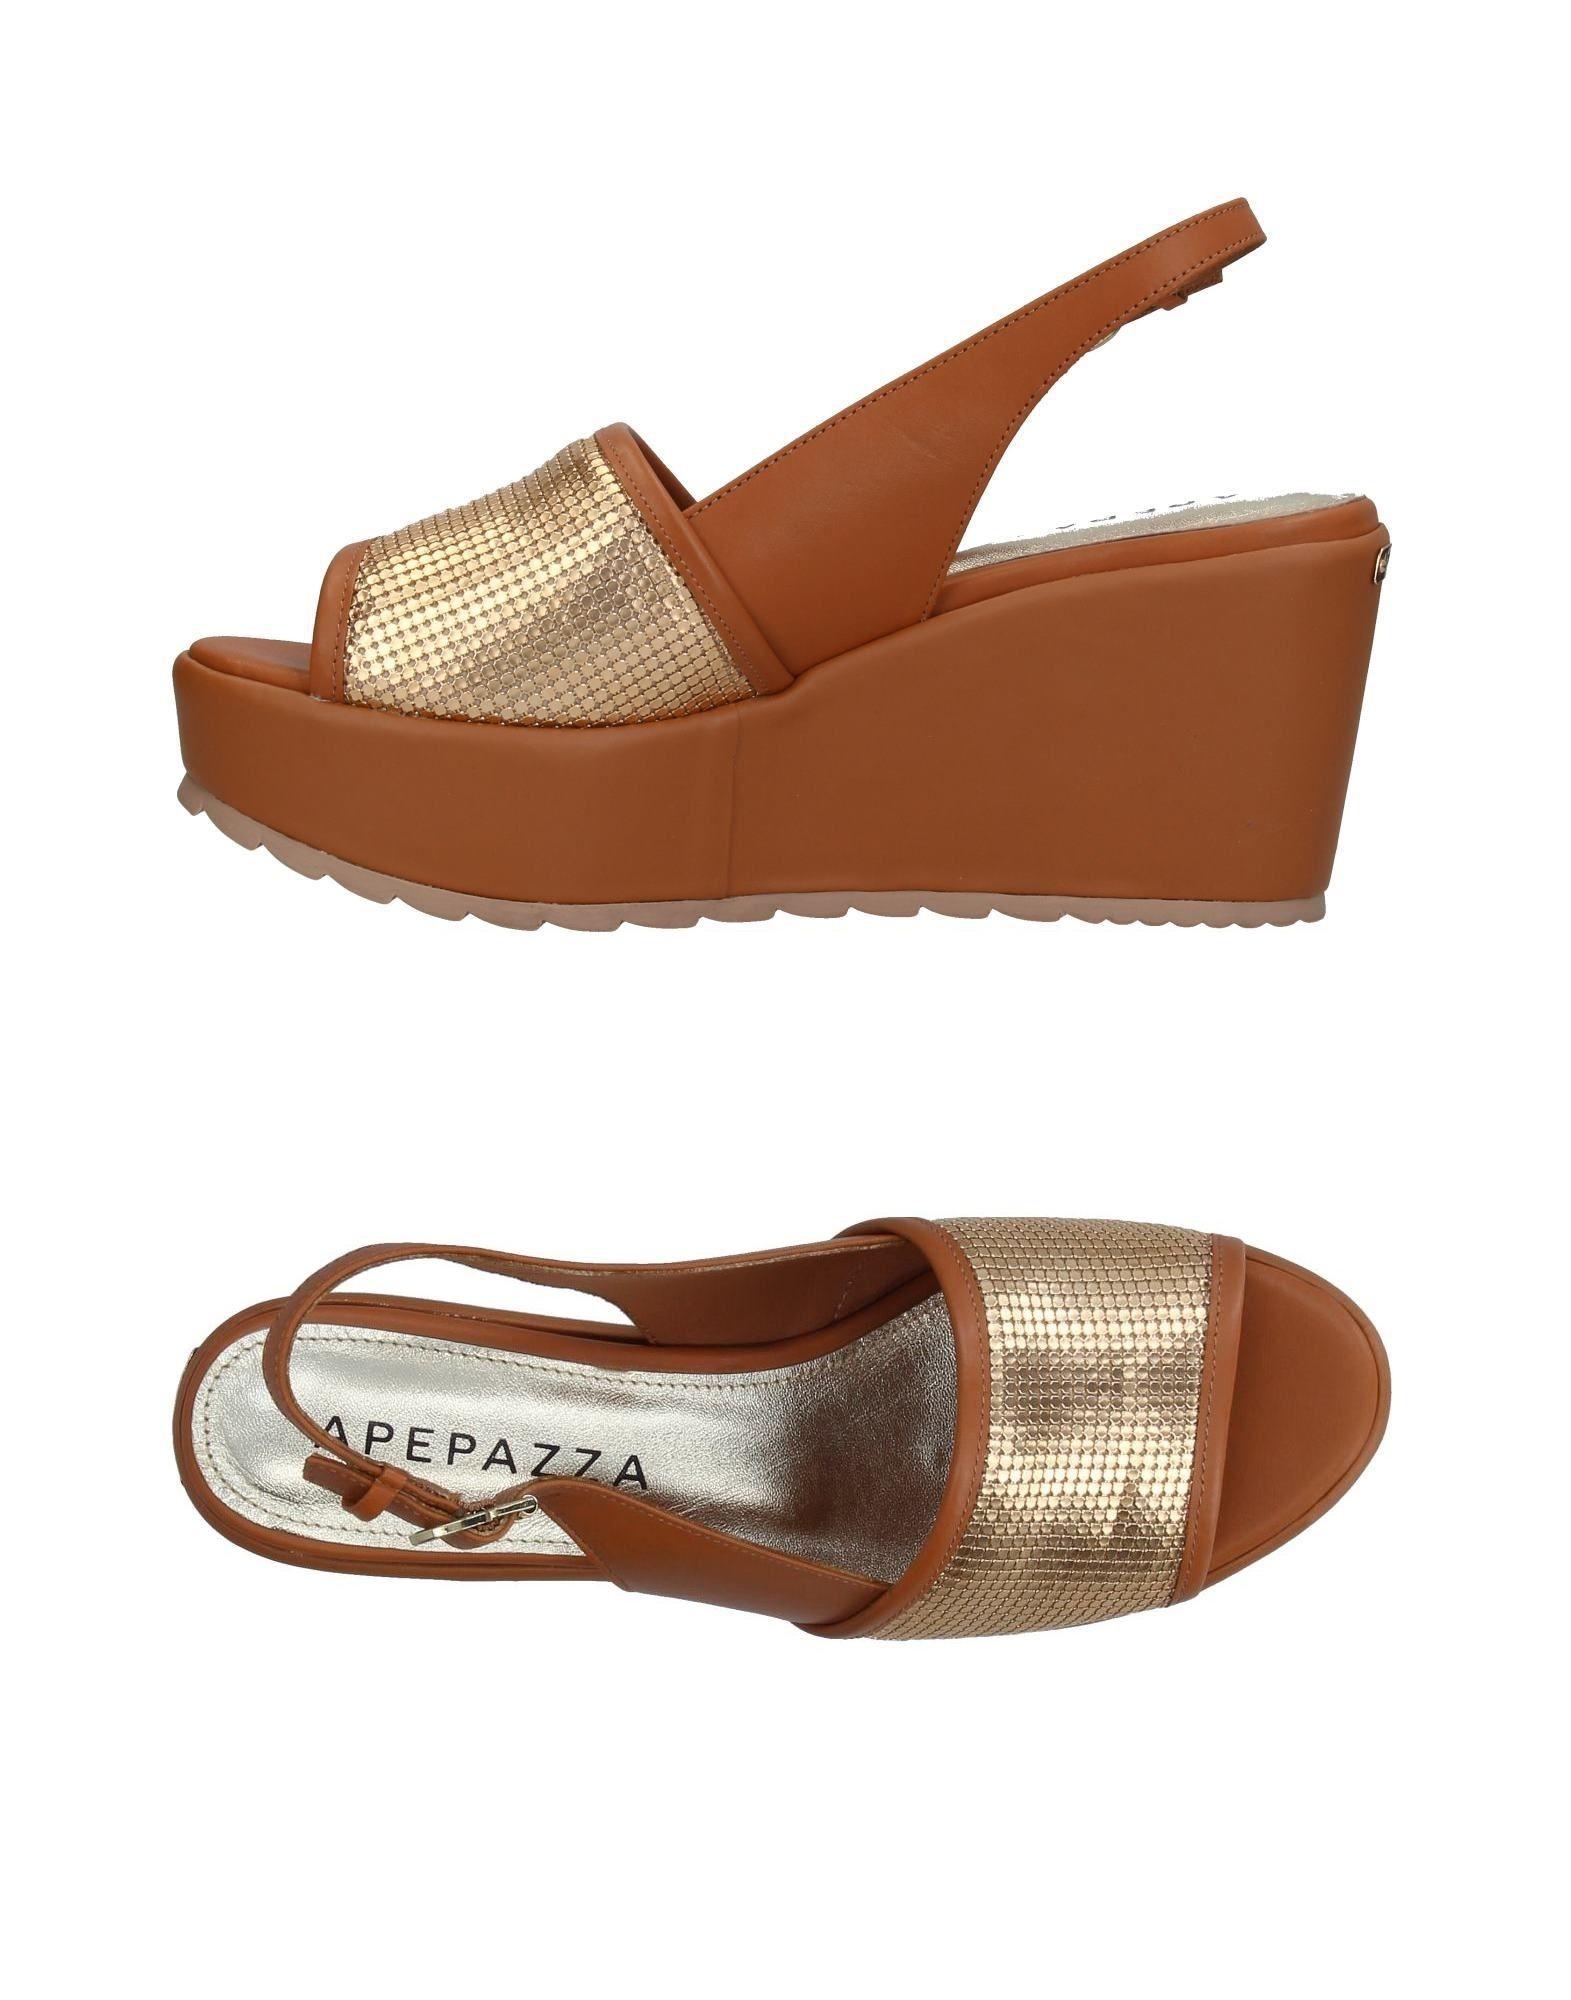 Apepazza Sandalen Damen  11356881FK Gute Qualität beliebte Schuhe